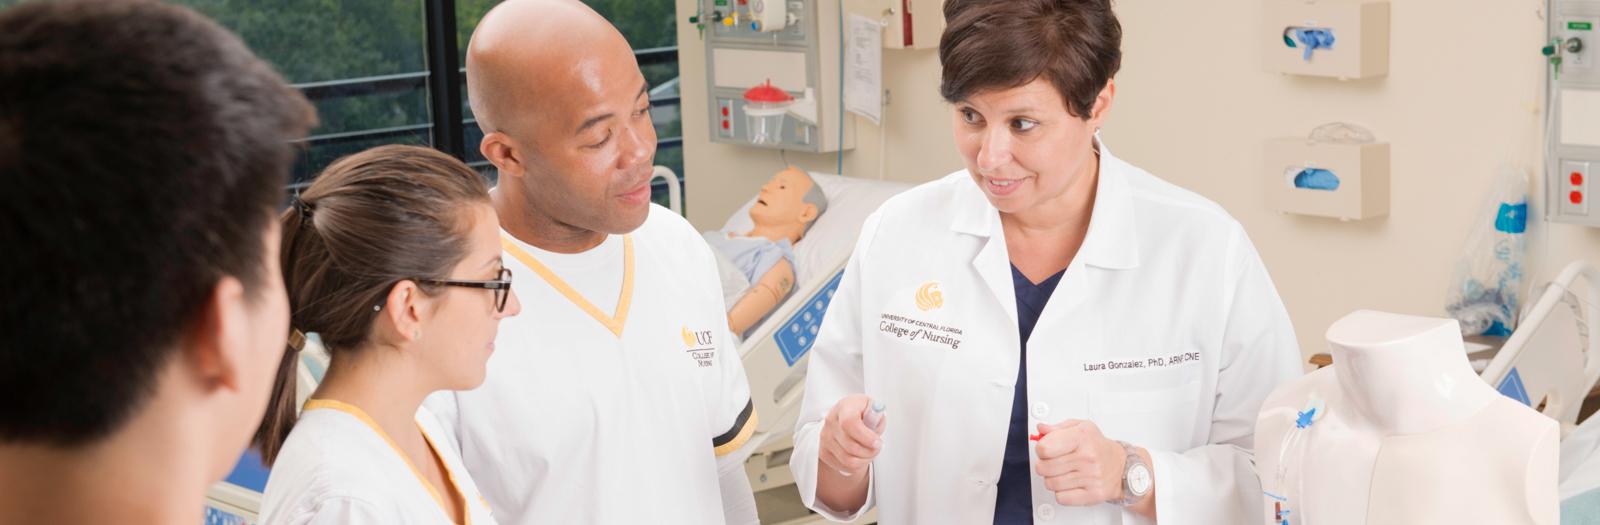 Ucf Nurse Spring 2020.Admissions For Bachelor S In Nursing Degrees Ucf College